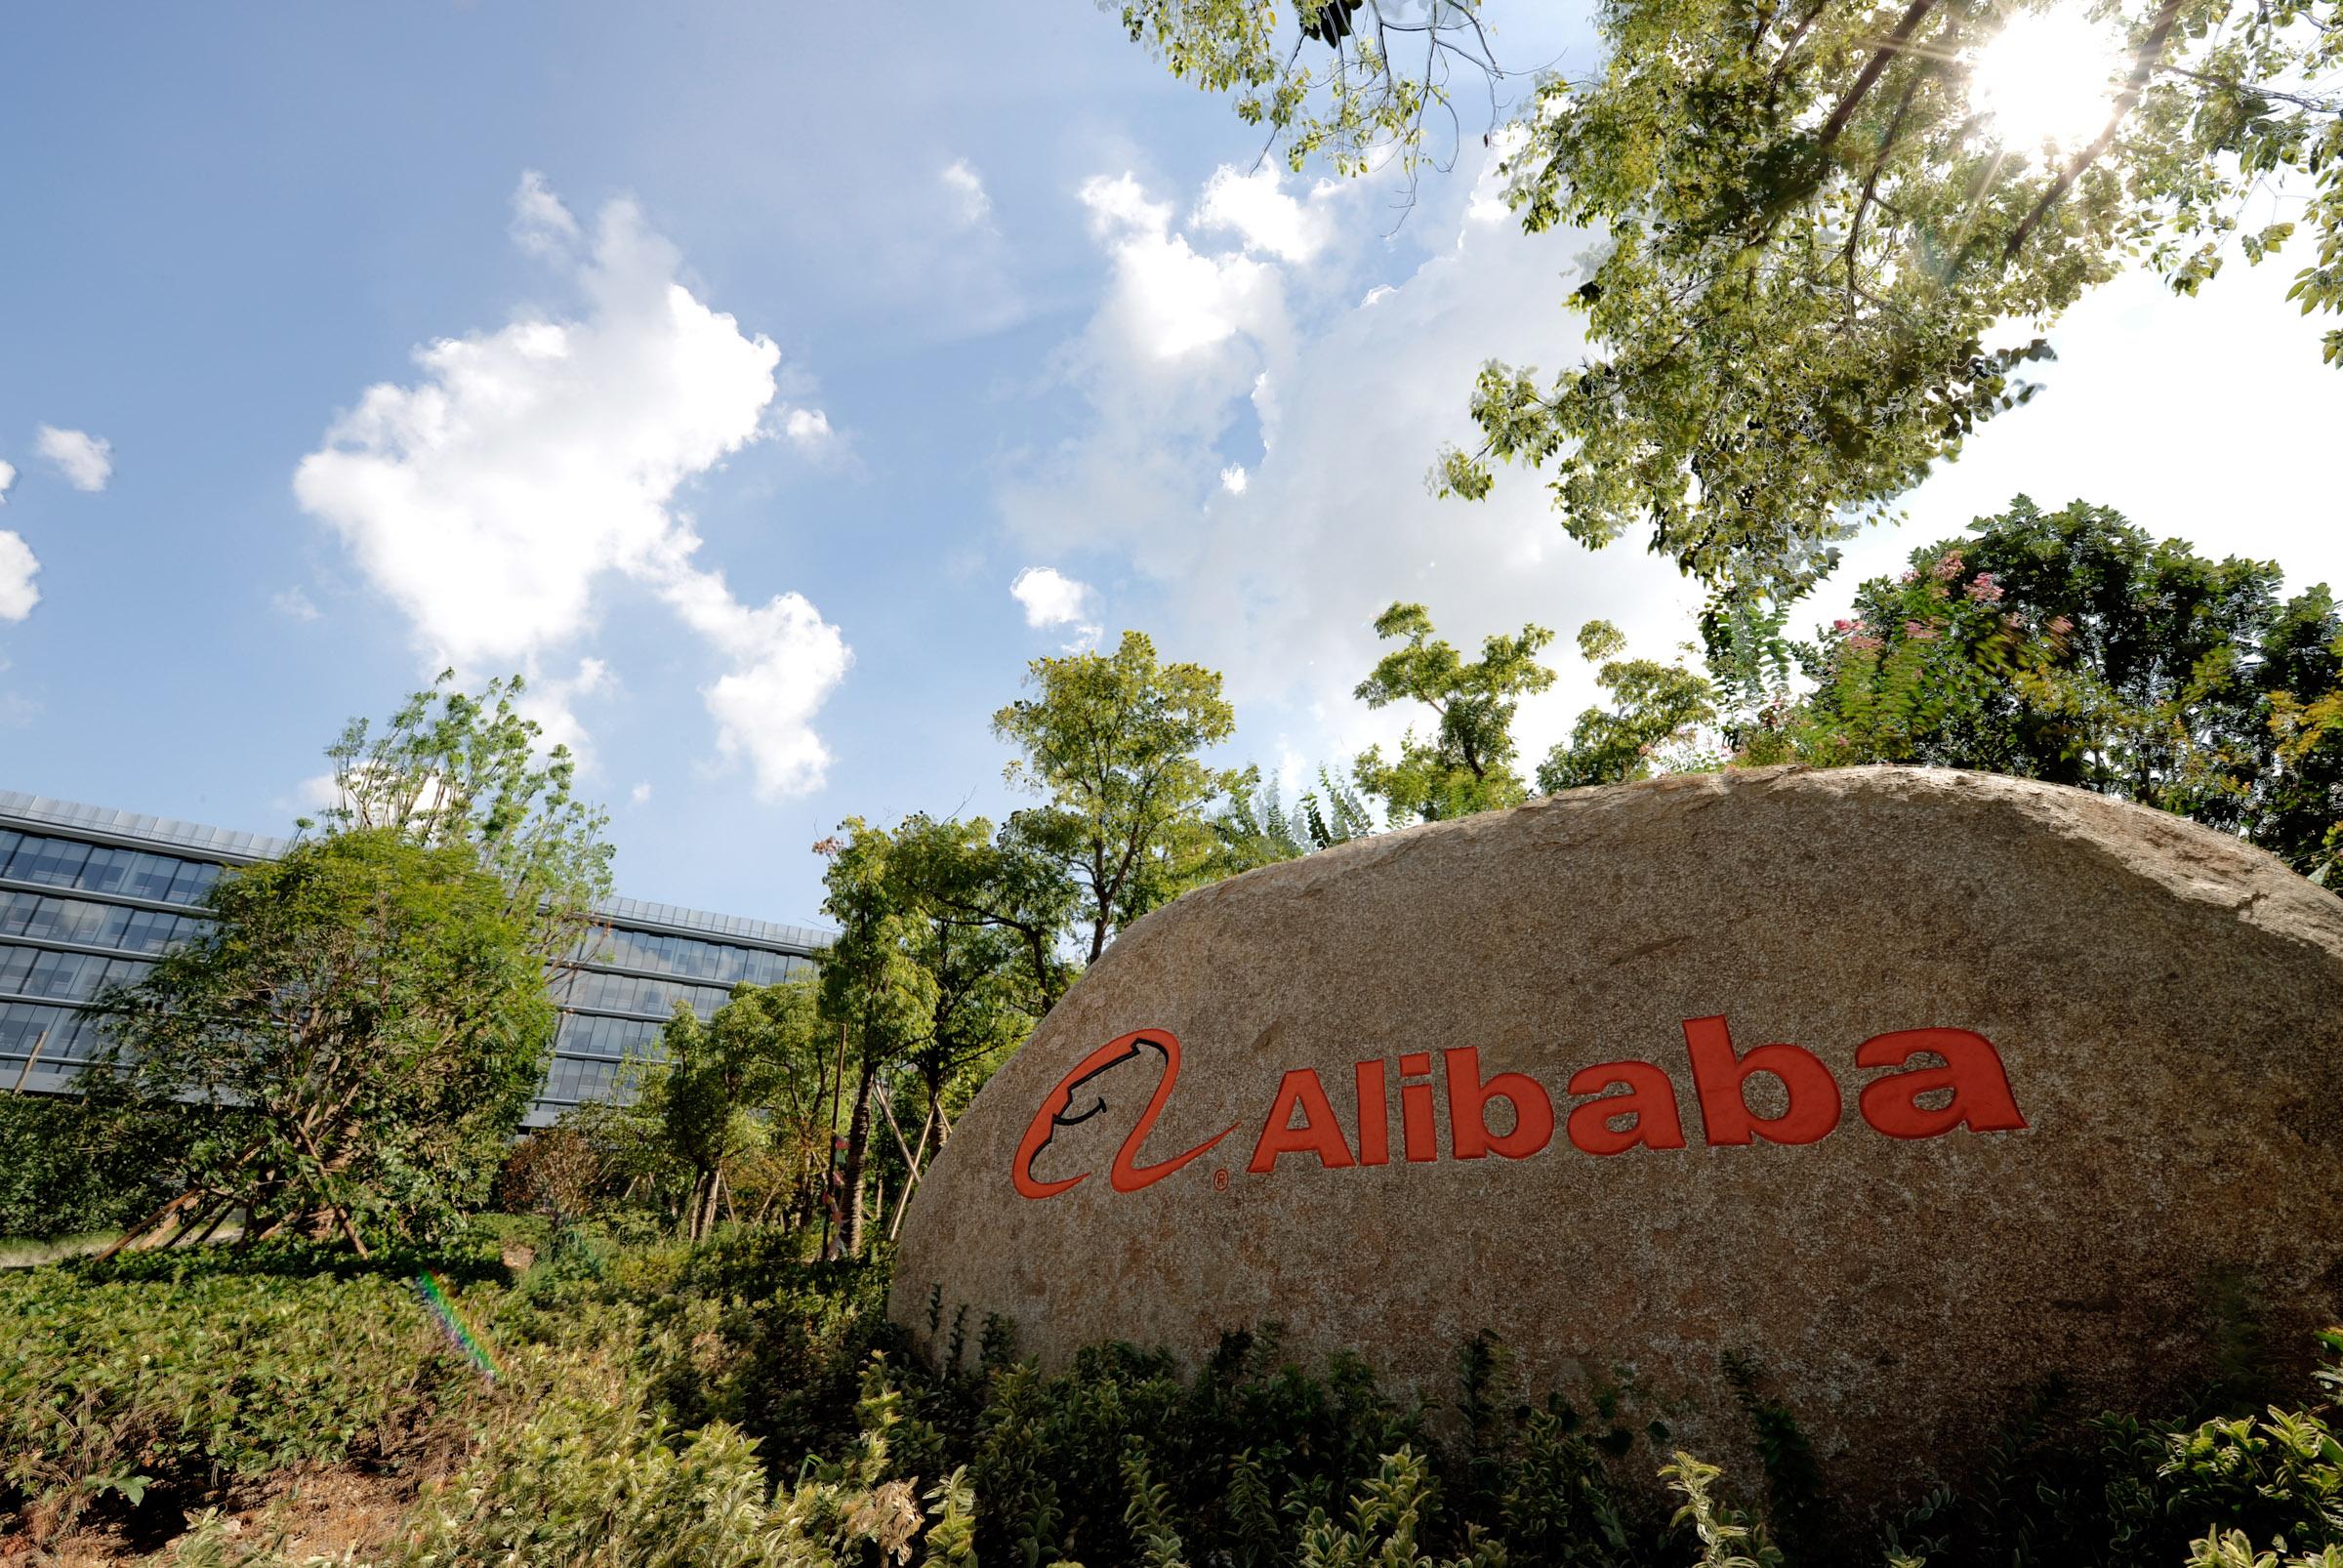 Alibaba Group's headquarters in Hangzhou, China